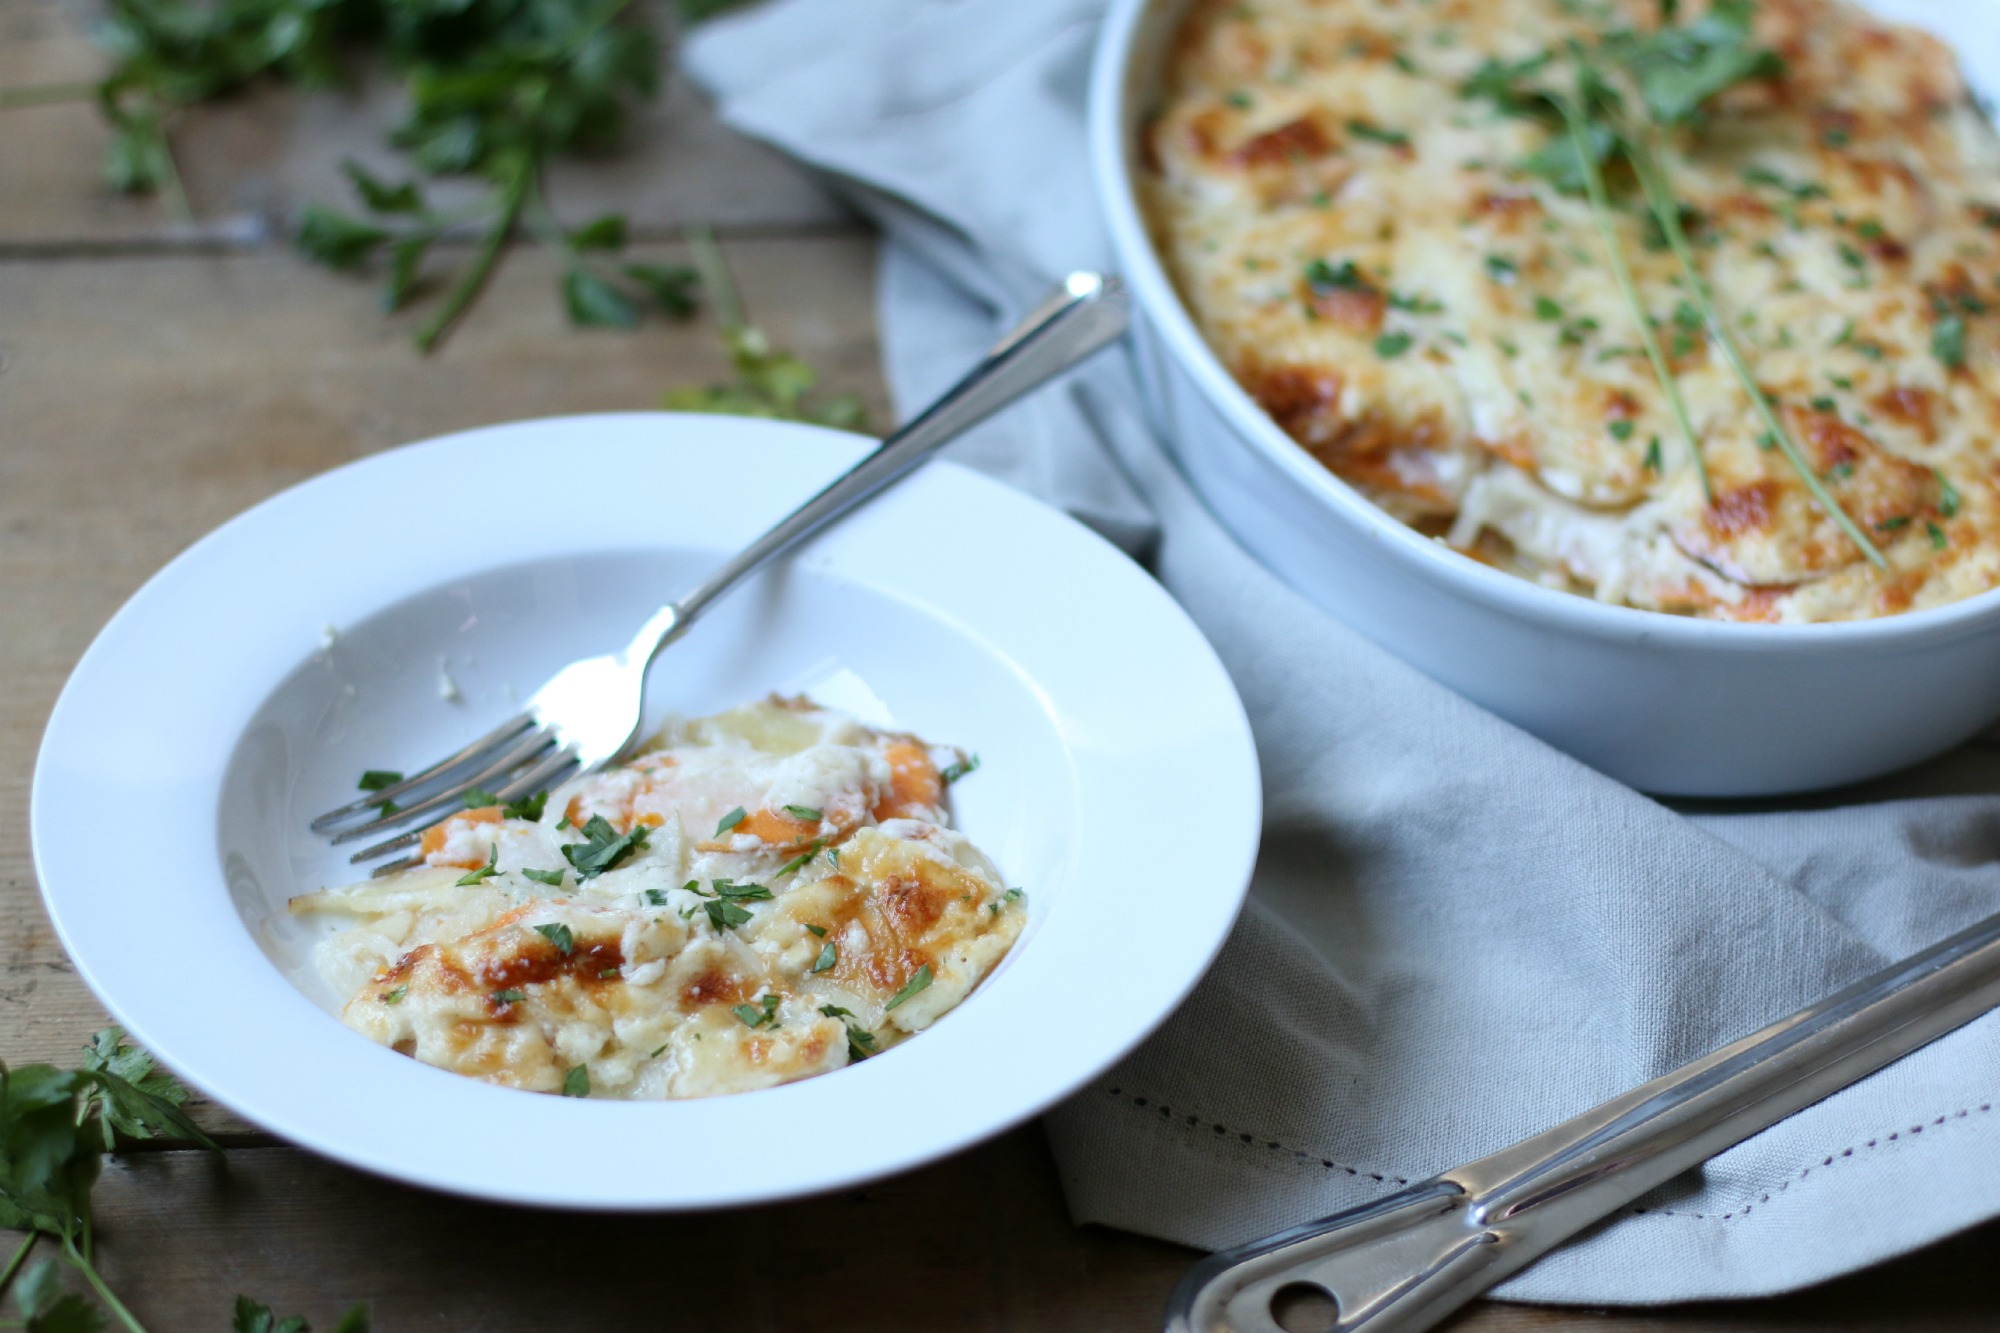 Dish of Au Gratin